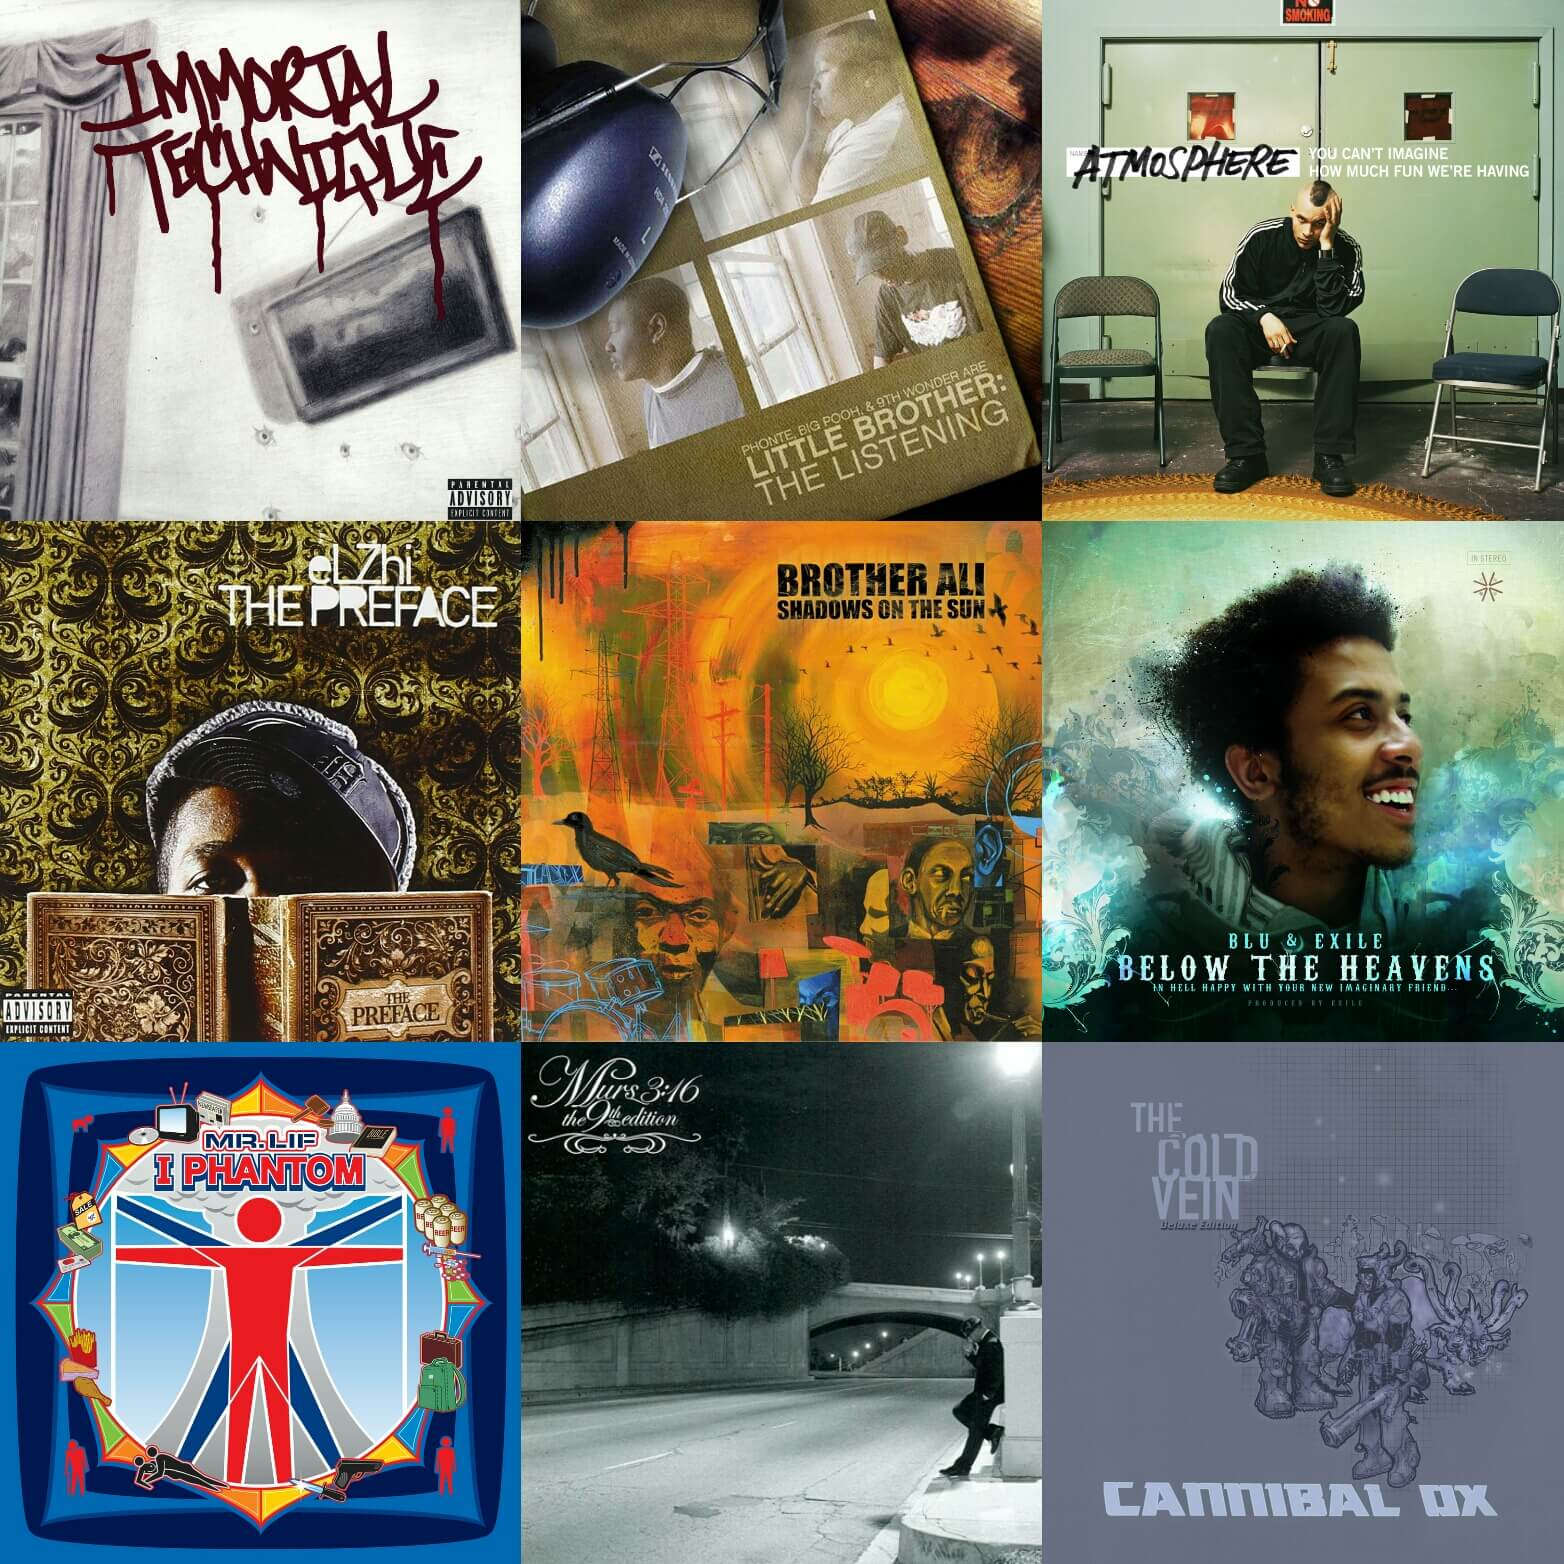 Top 25 Underground Hip Hop Albums    Of All Time - Hip Hop